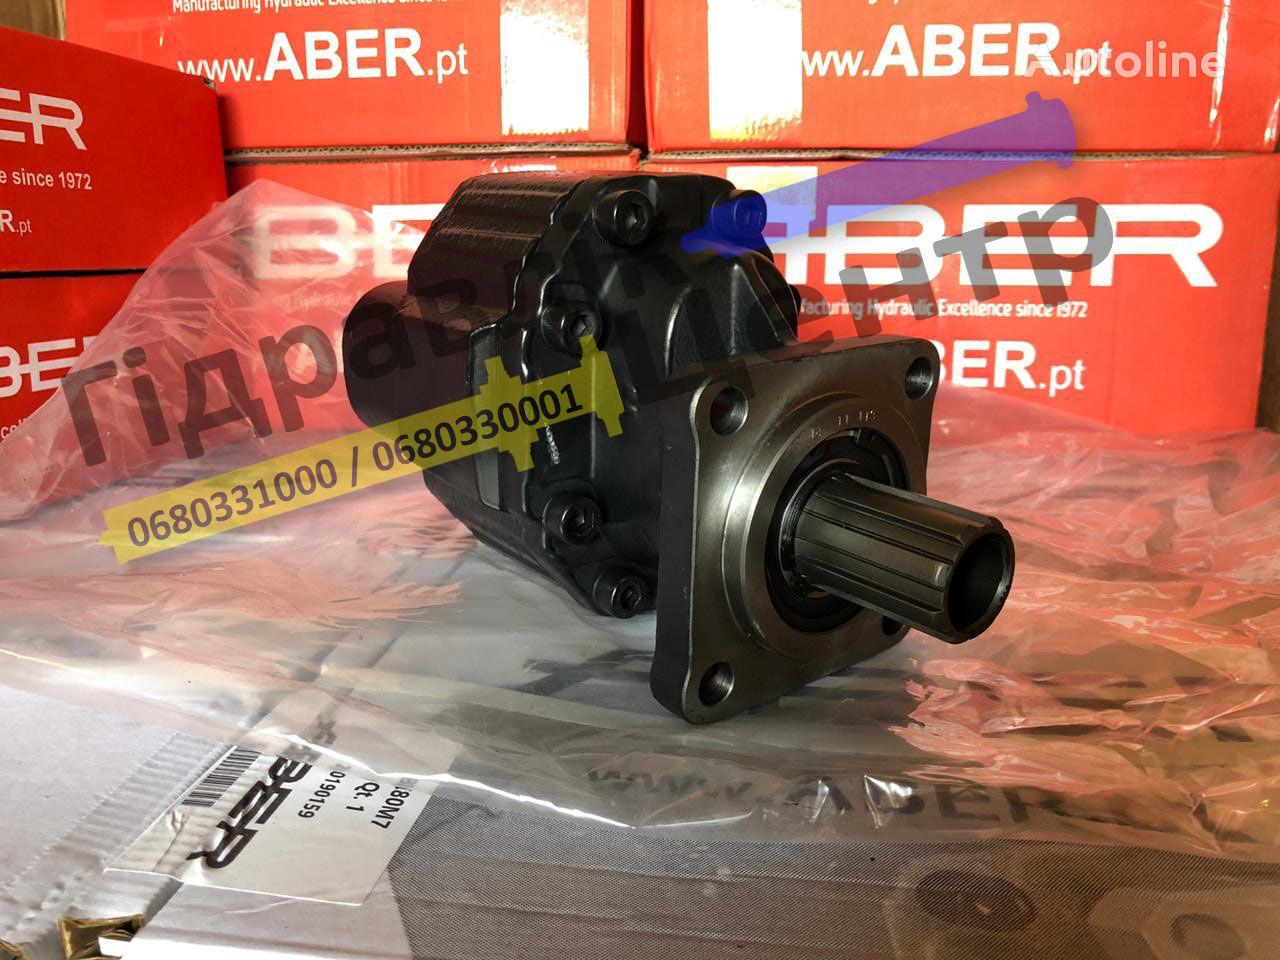 new Aber, Hyva, Binotto, Bezares gear pump for truck